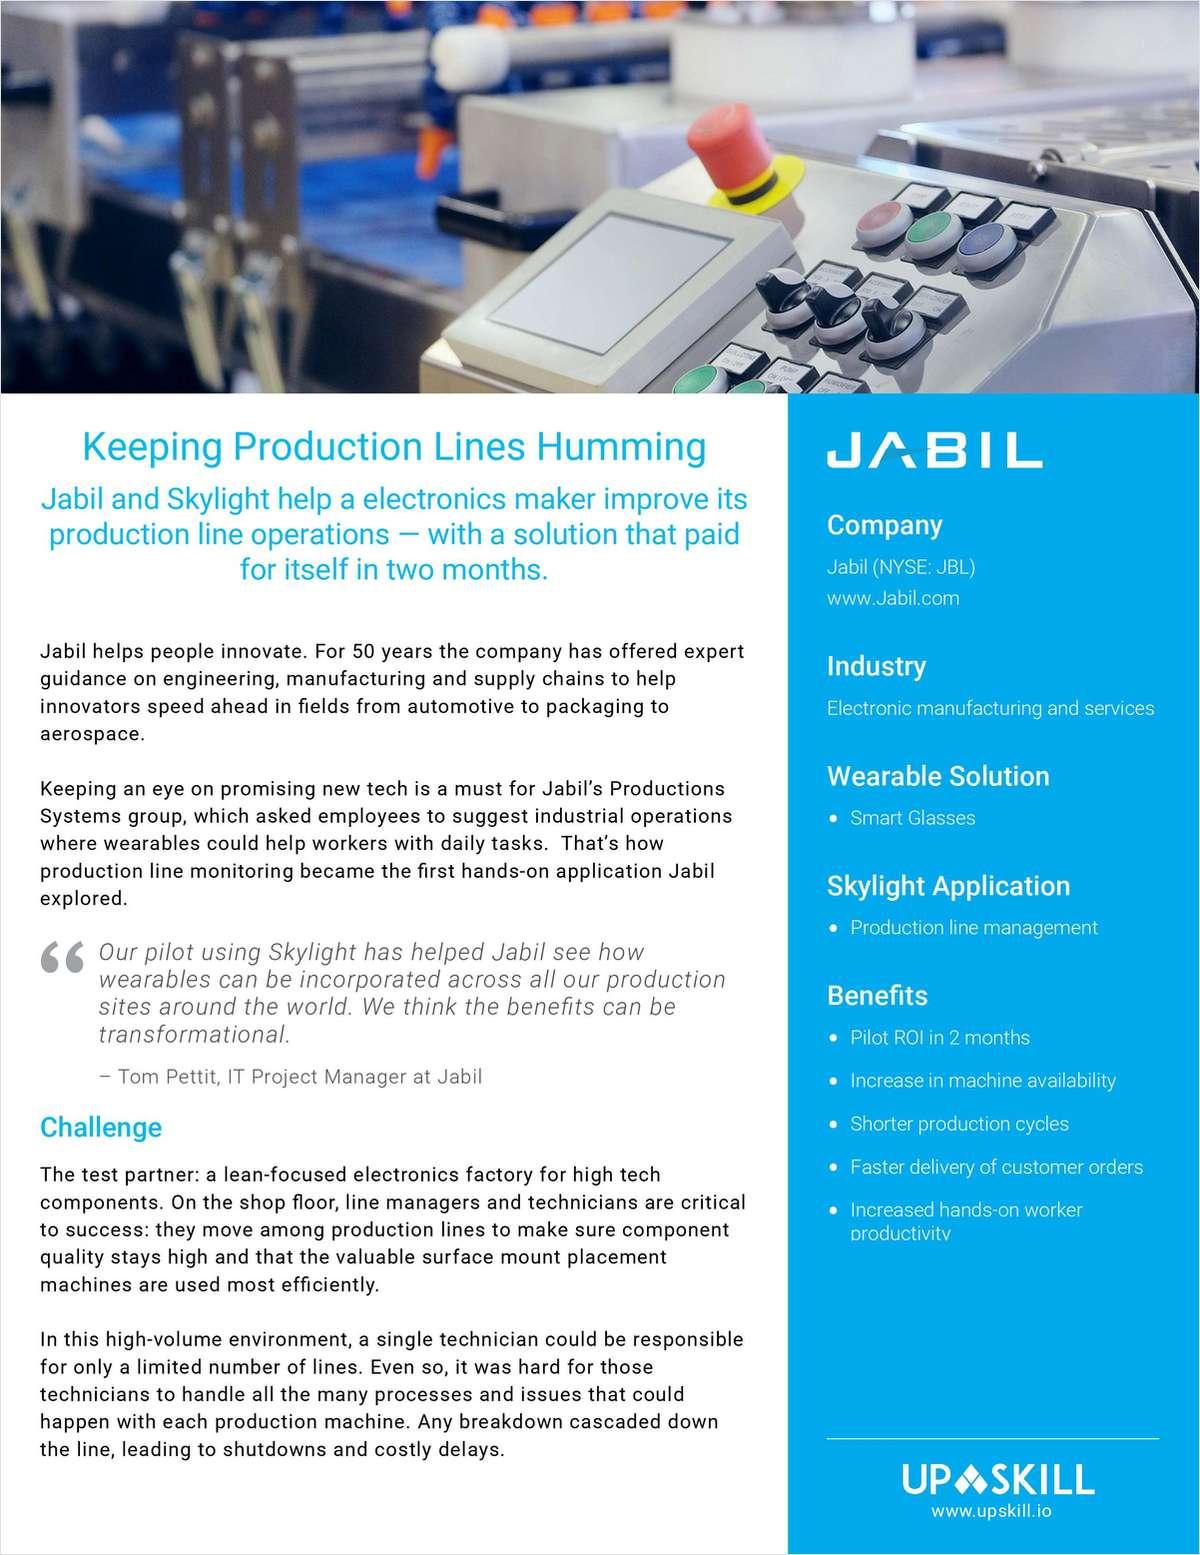 How Jabil Keeps Production Lines Humming Using Smart Glasses